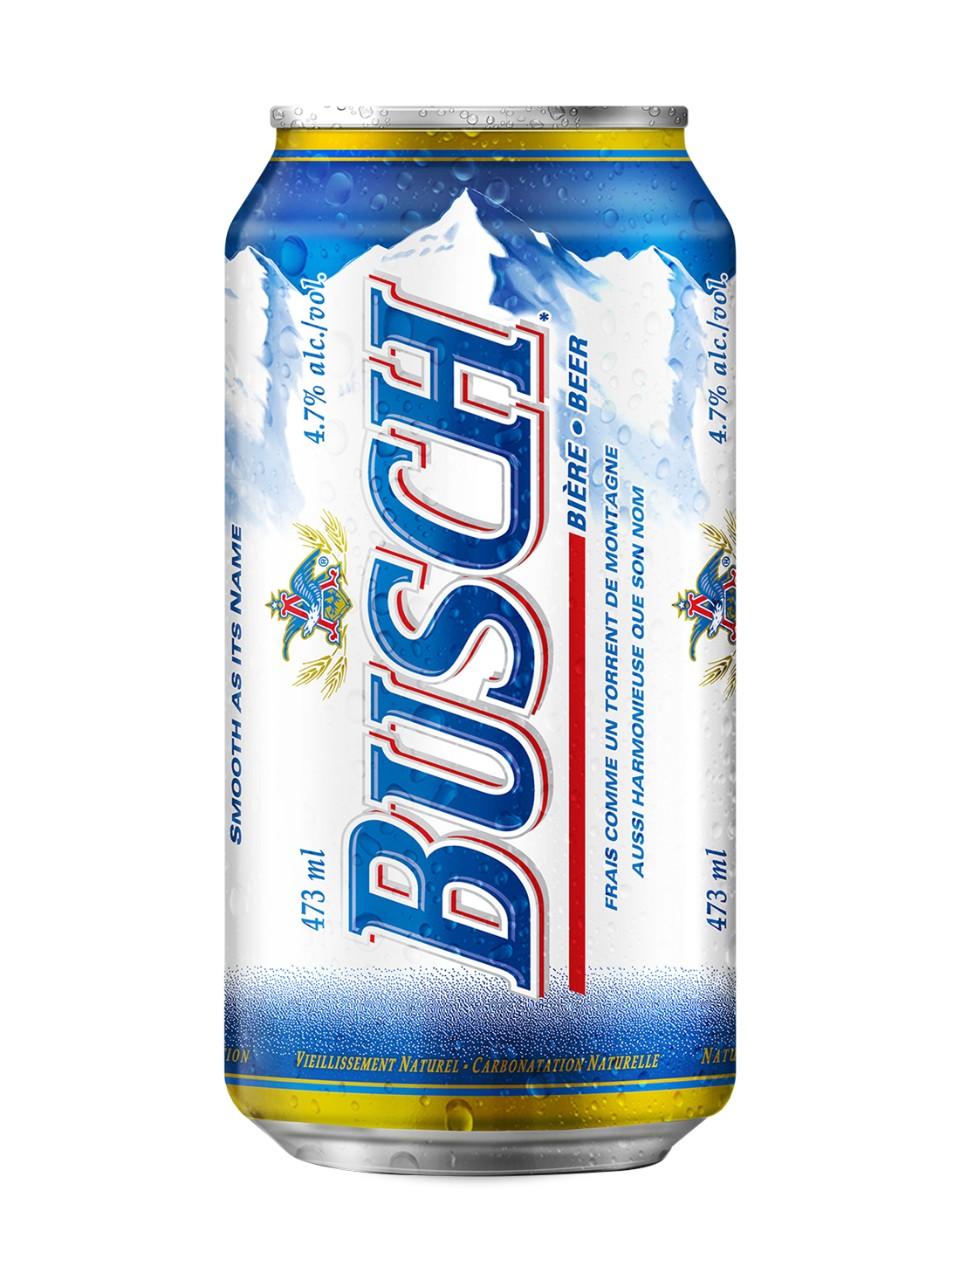 Busch Ice | LCBO